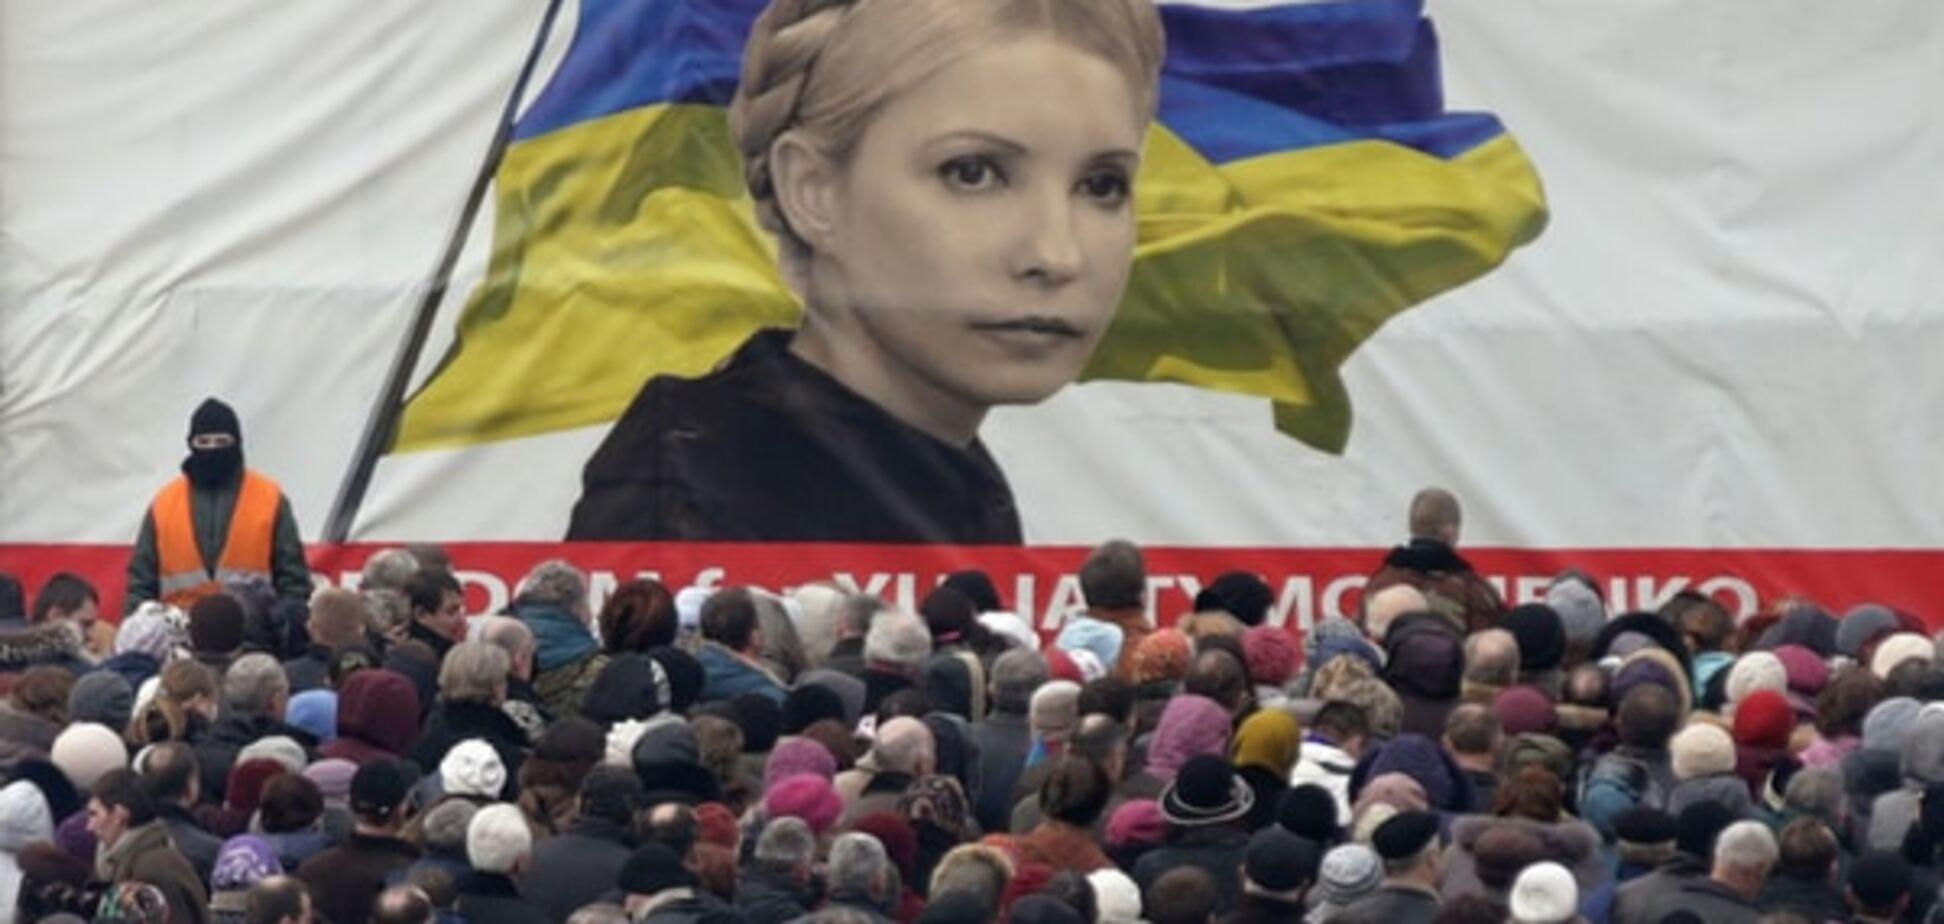 Суд вынес приговор избивавшим Тимошенко VIP-тюремщикам